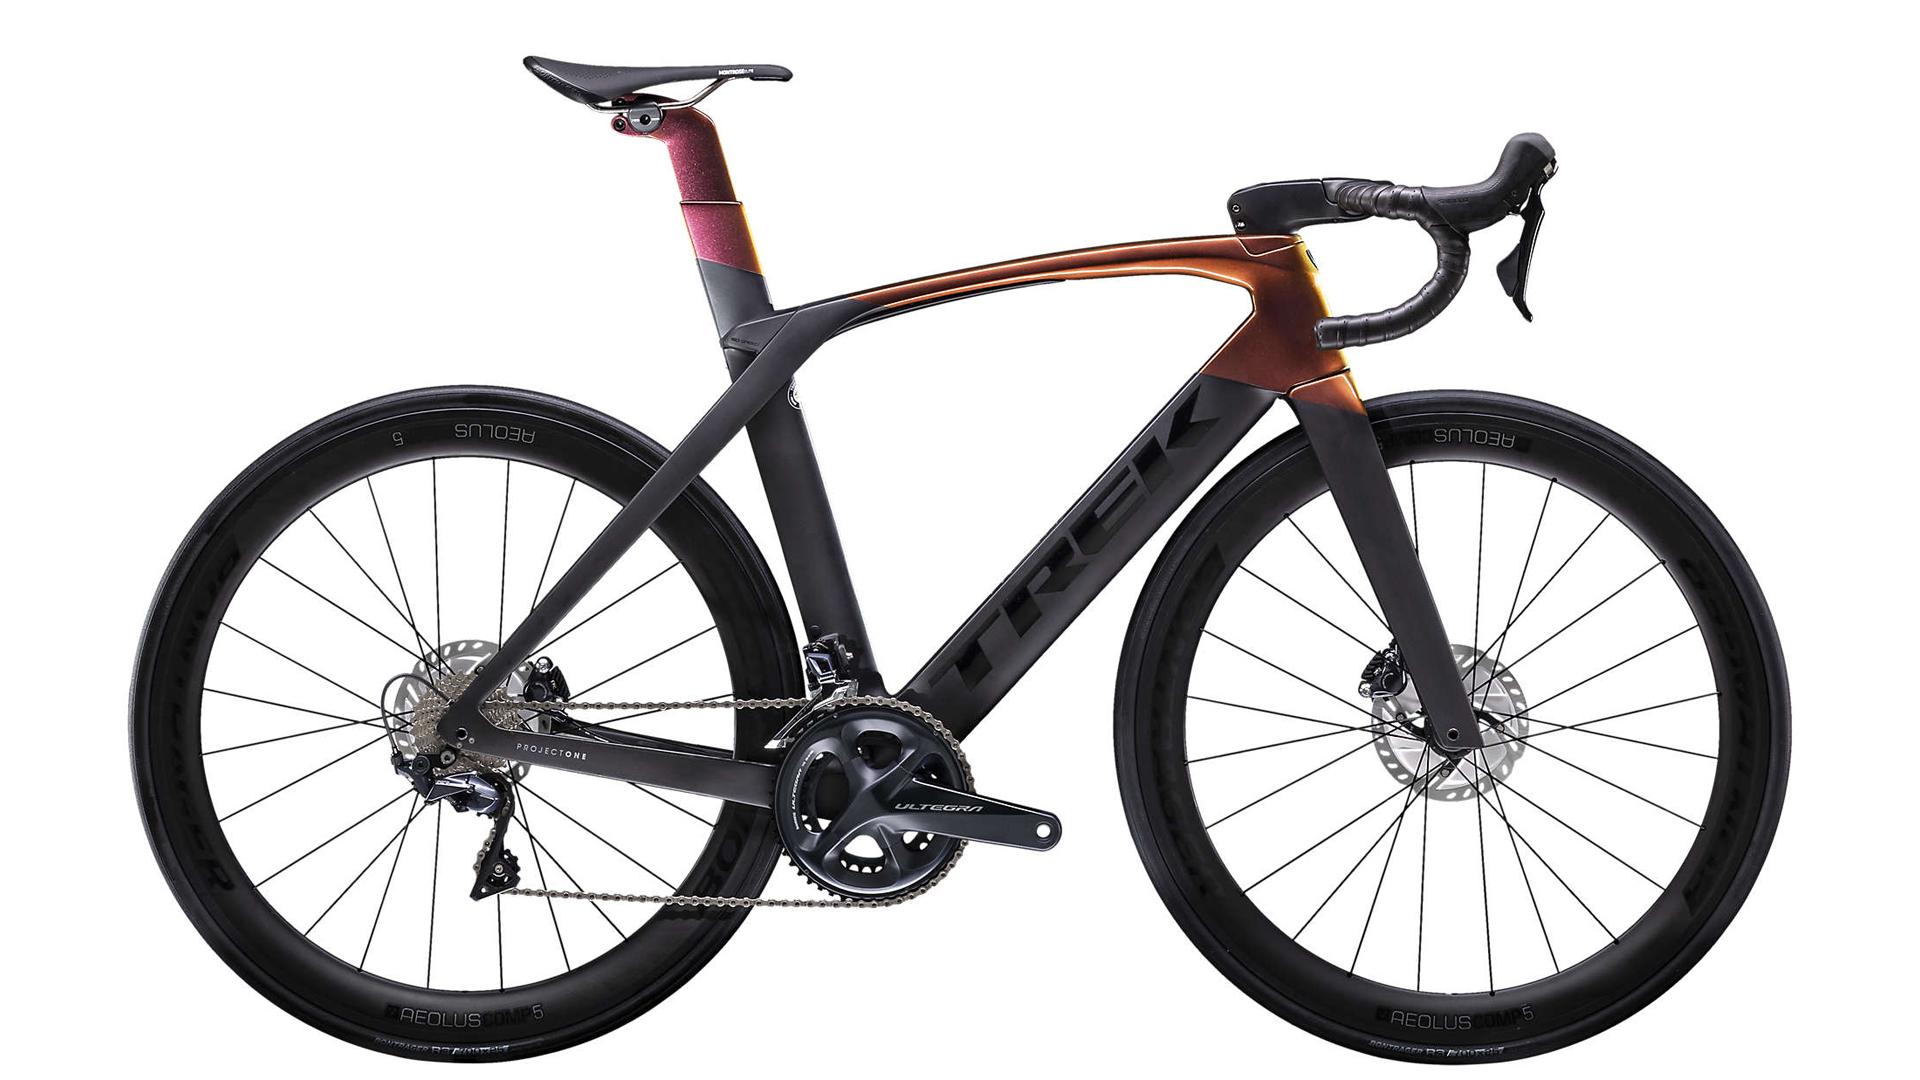 Best aero road bikes: Trek Madone SLR 6 Disc